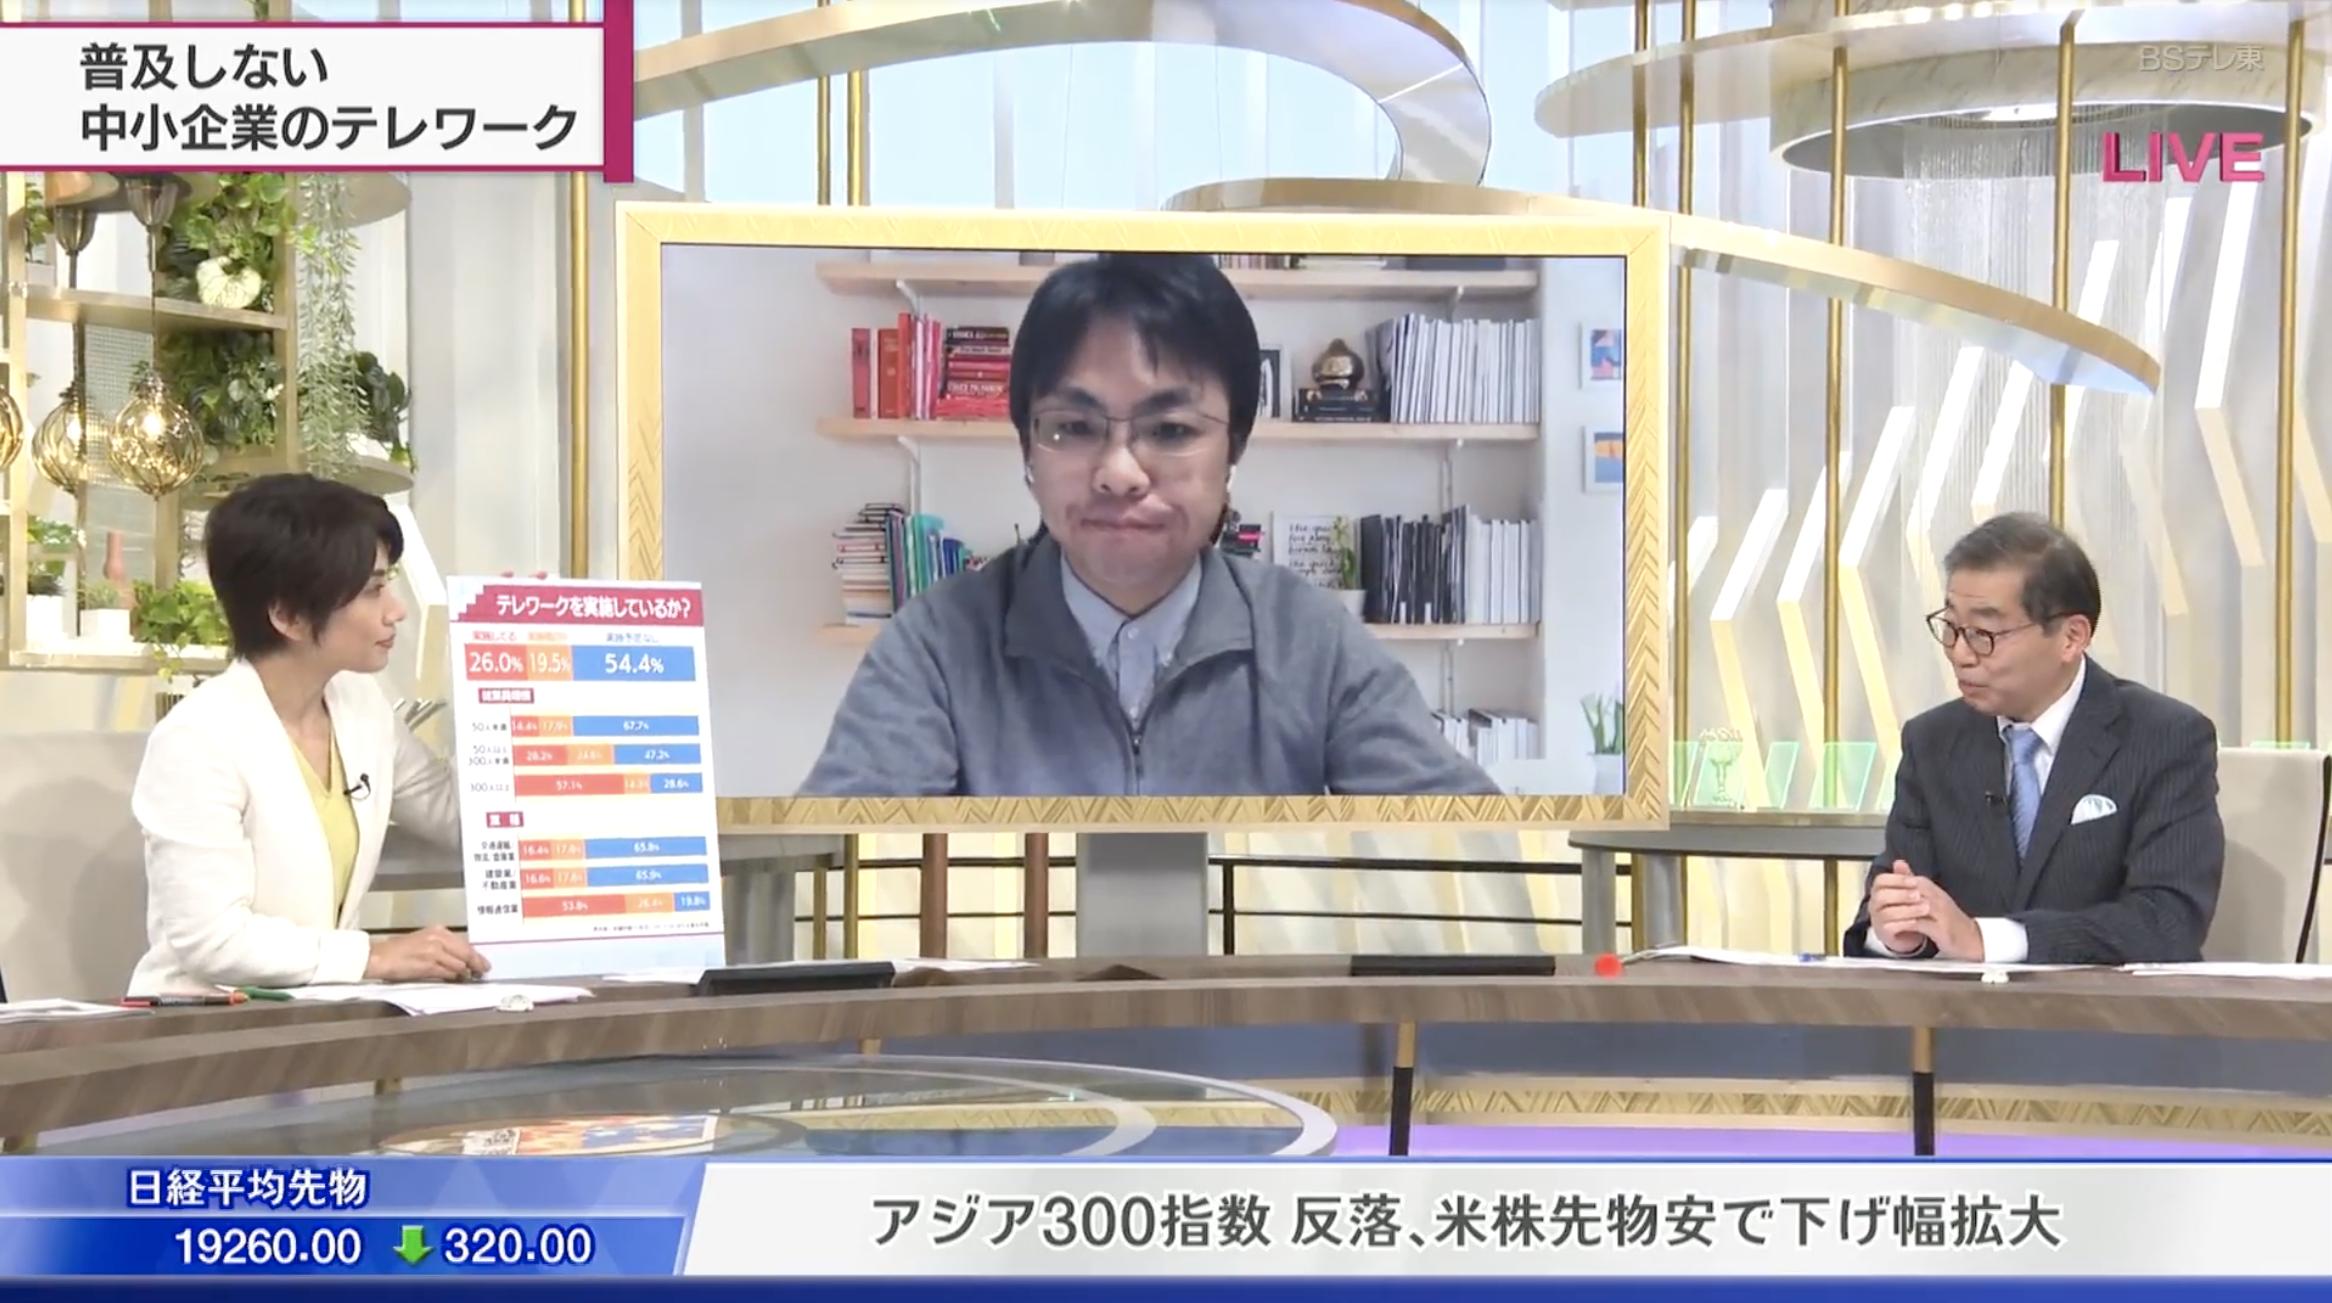 BSテレ東の経済報道番組「日経プラス10」にゲスト出演しました。